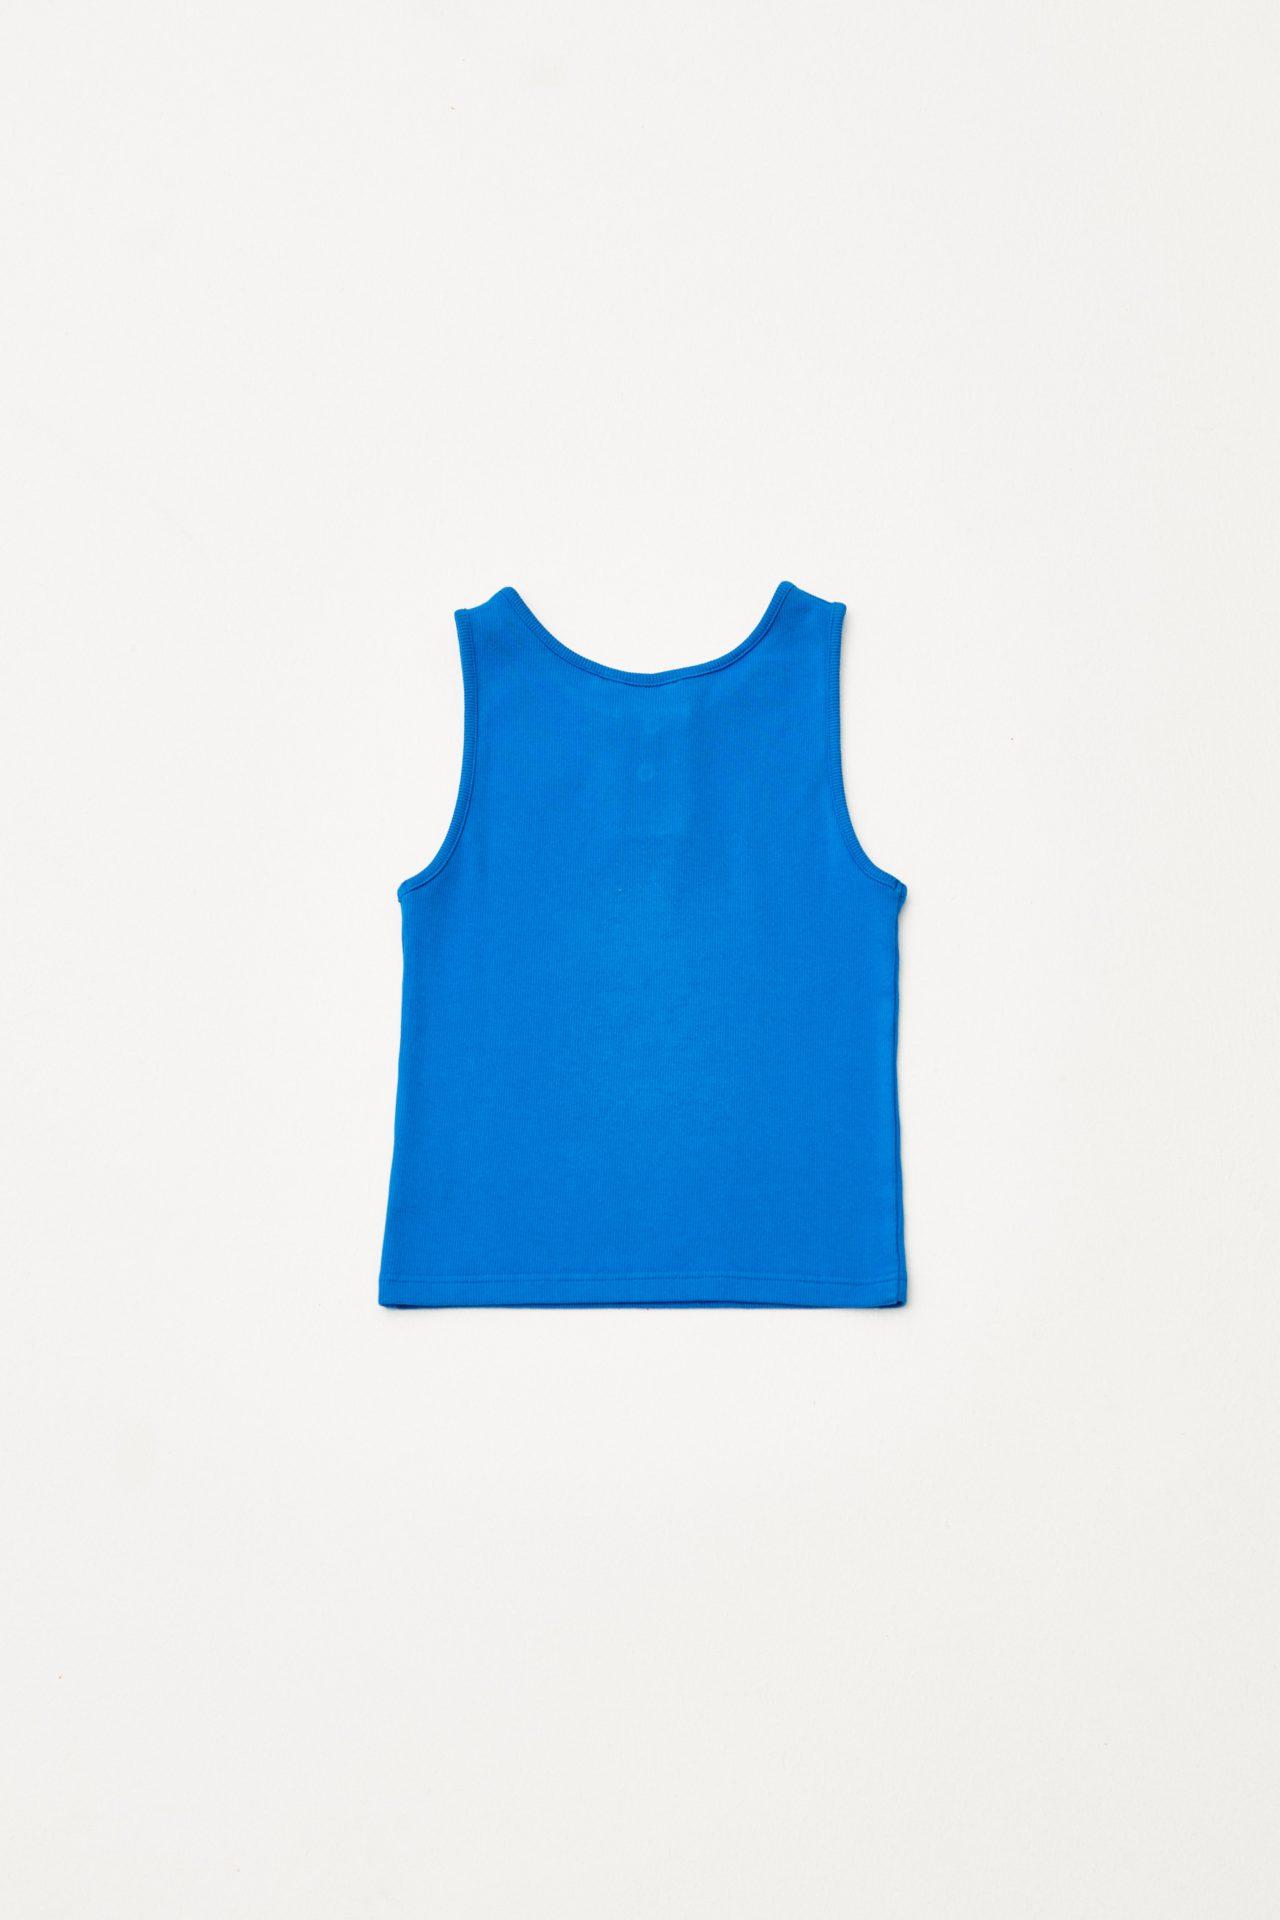 Embroidered Sleveless Tshirt back